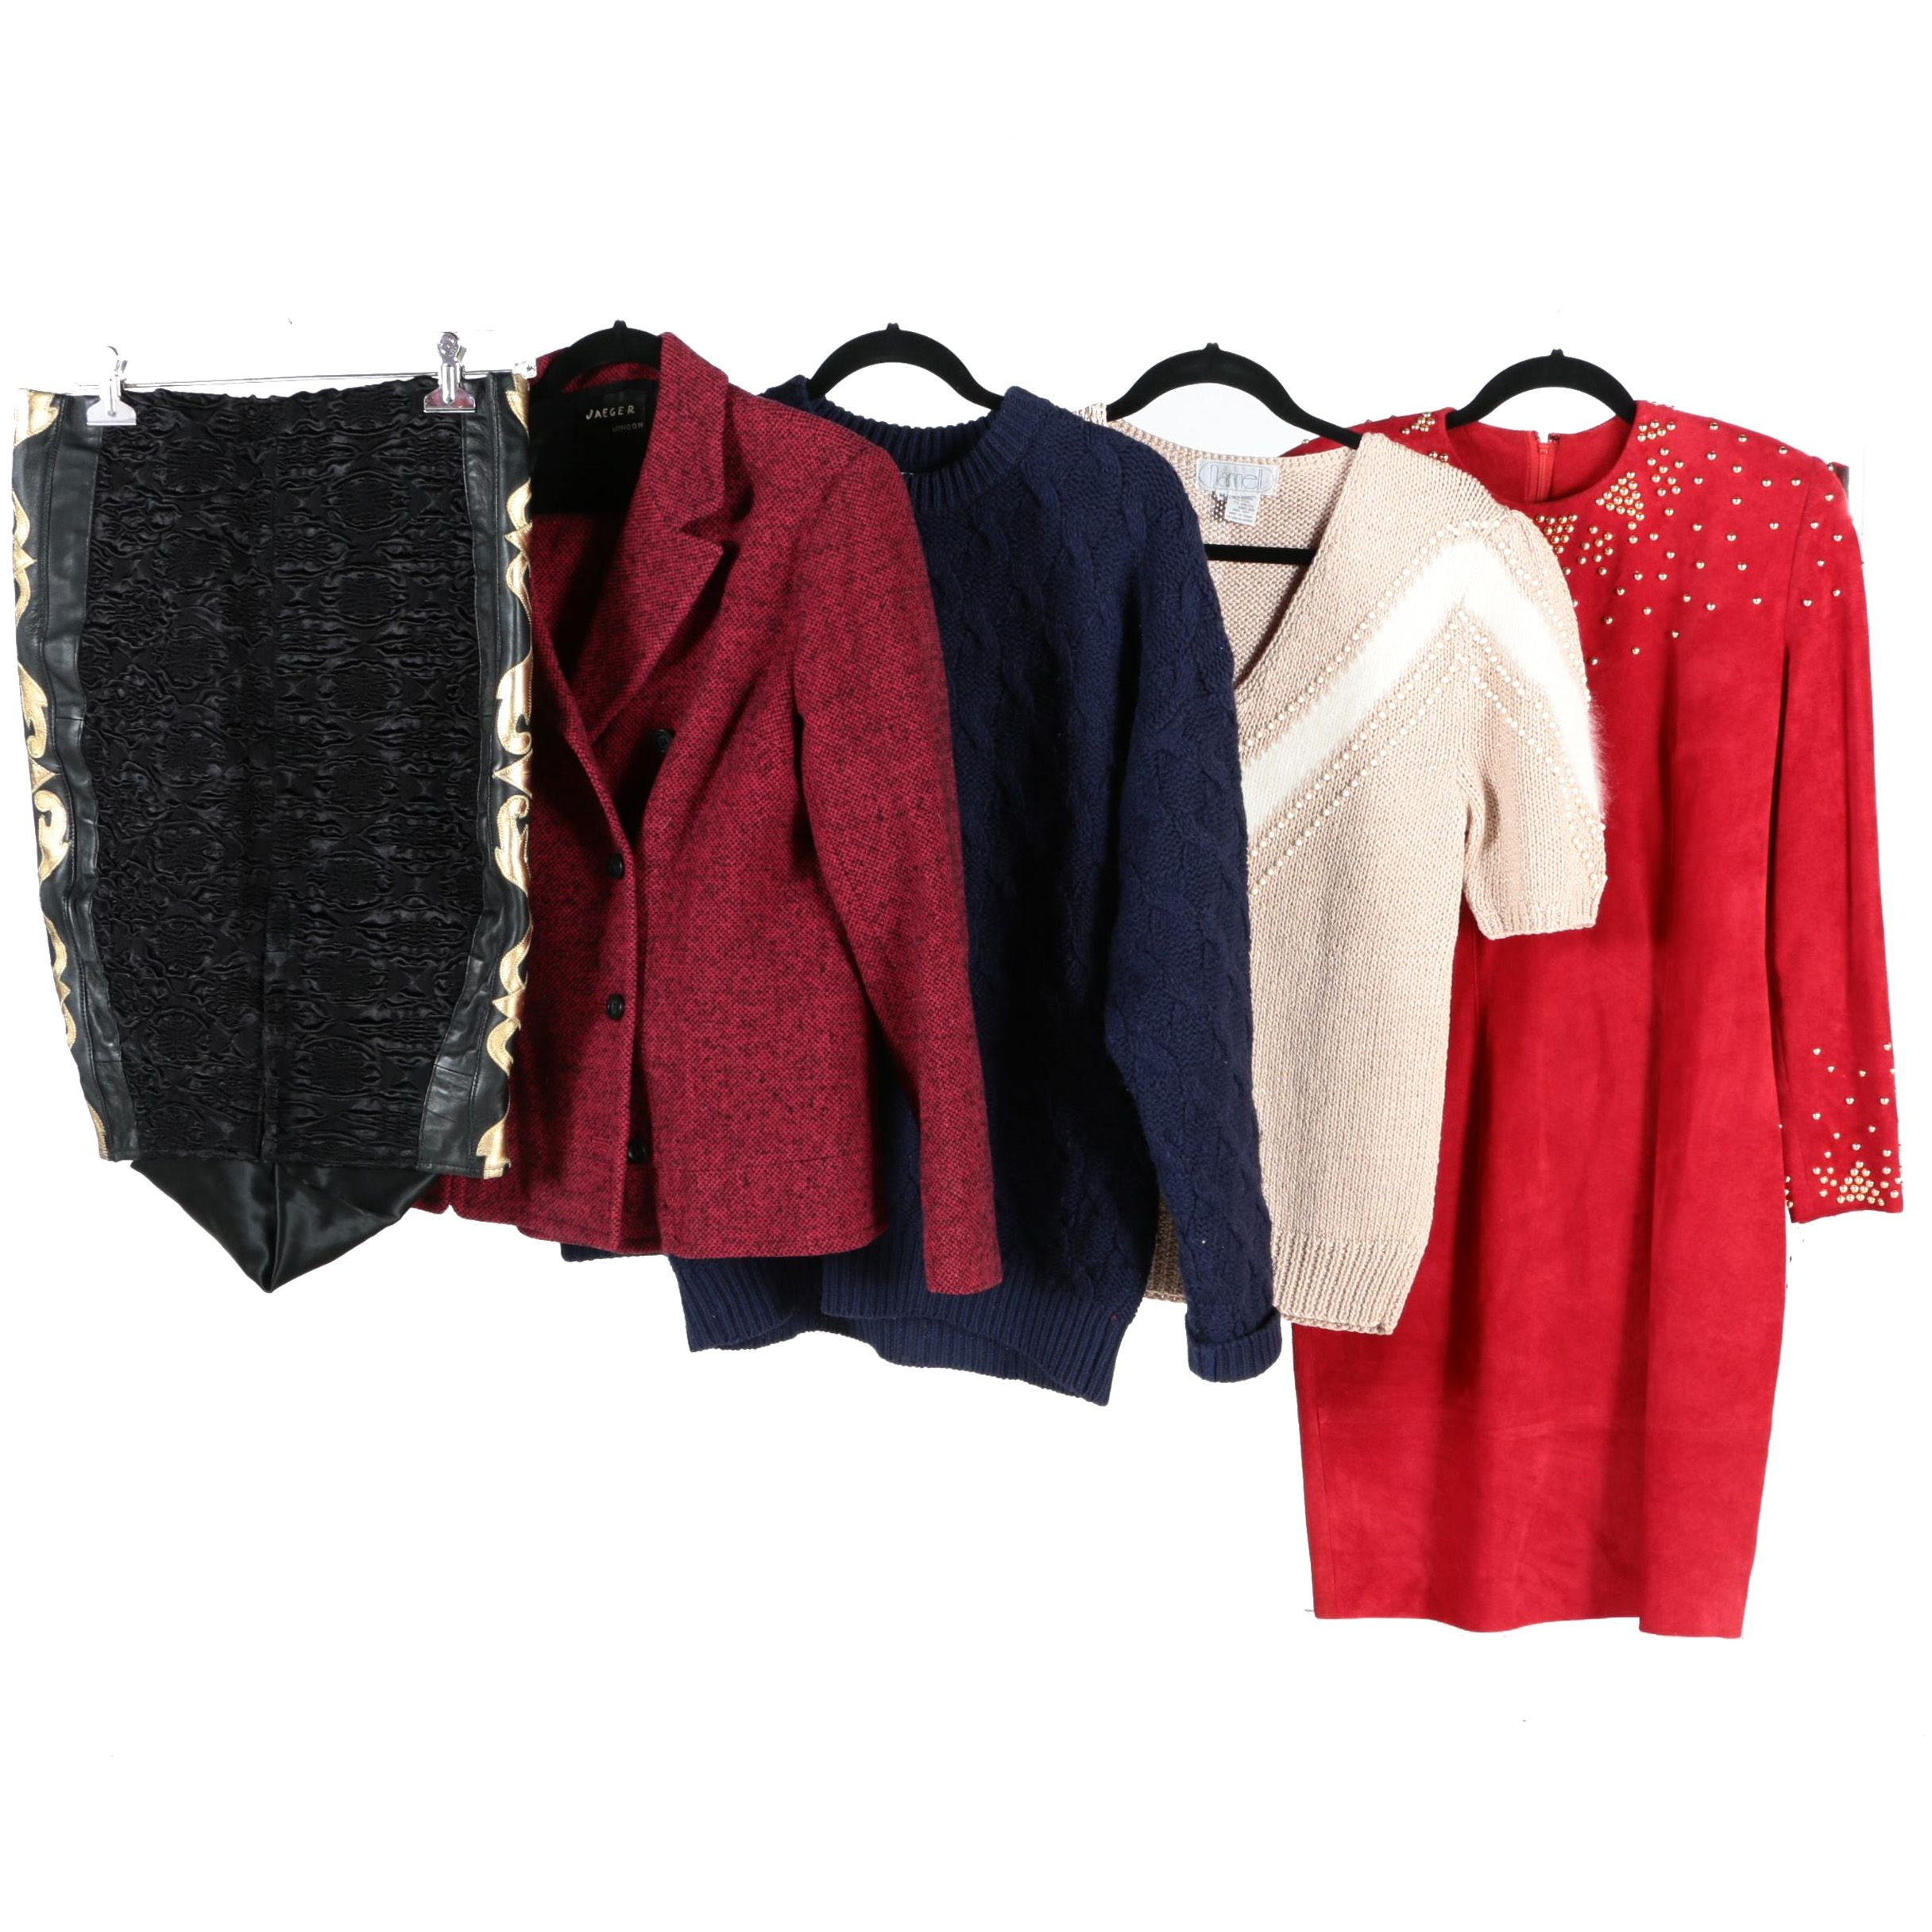 Women's Vintage Clothing Separates